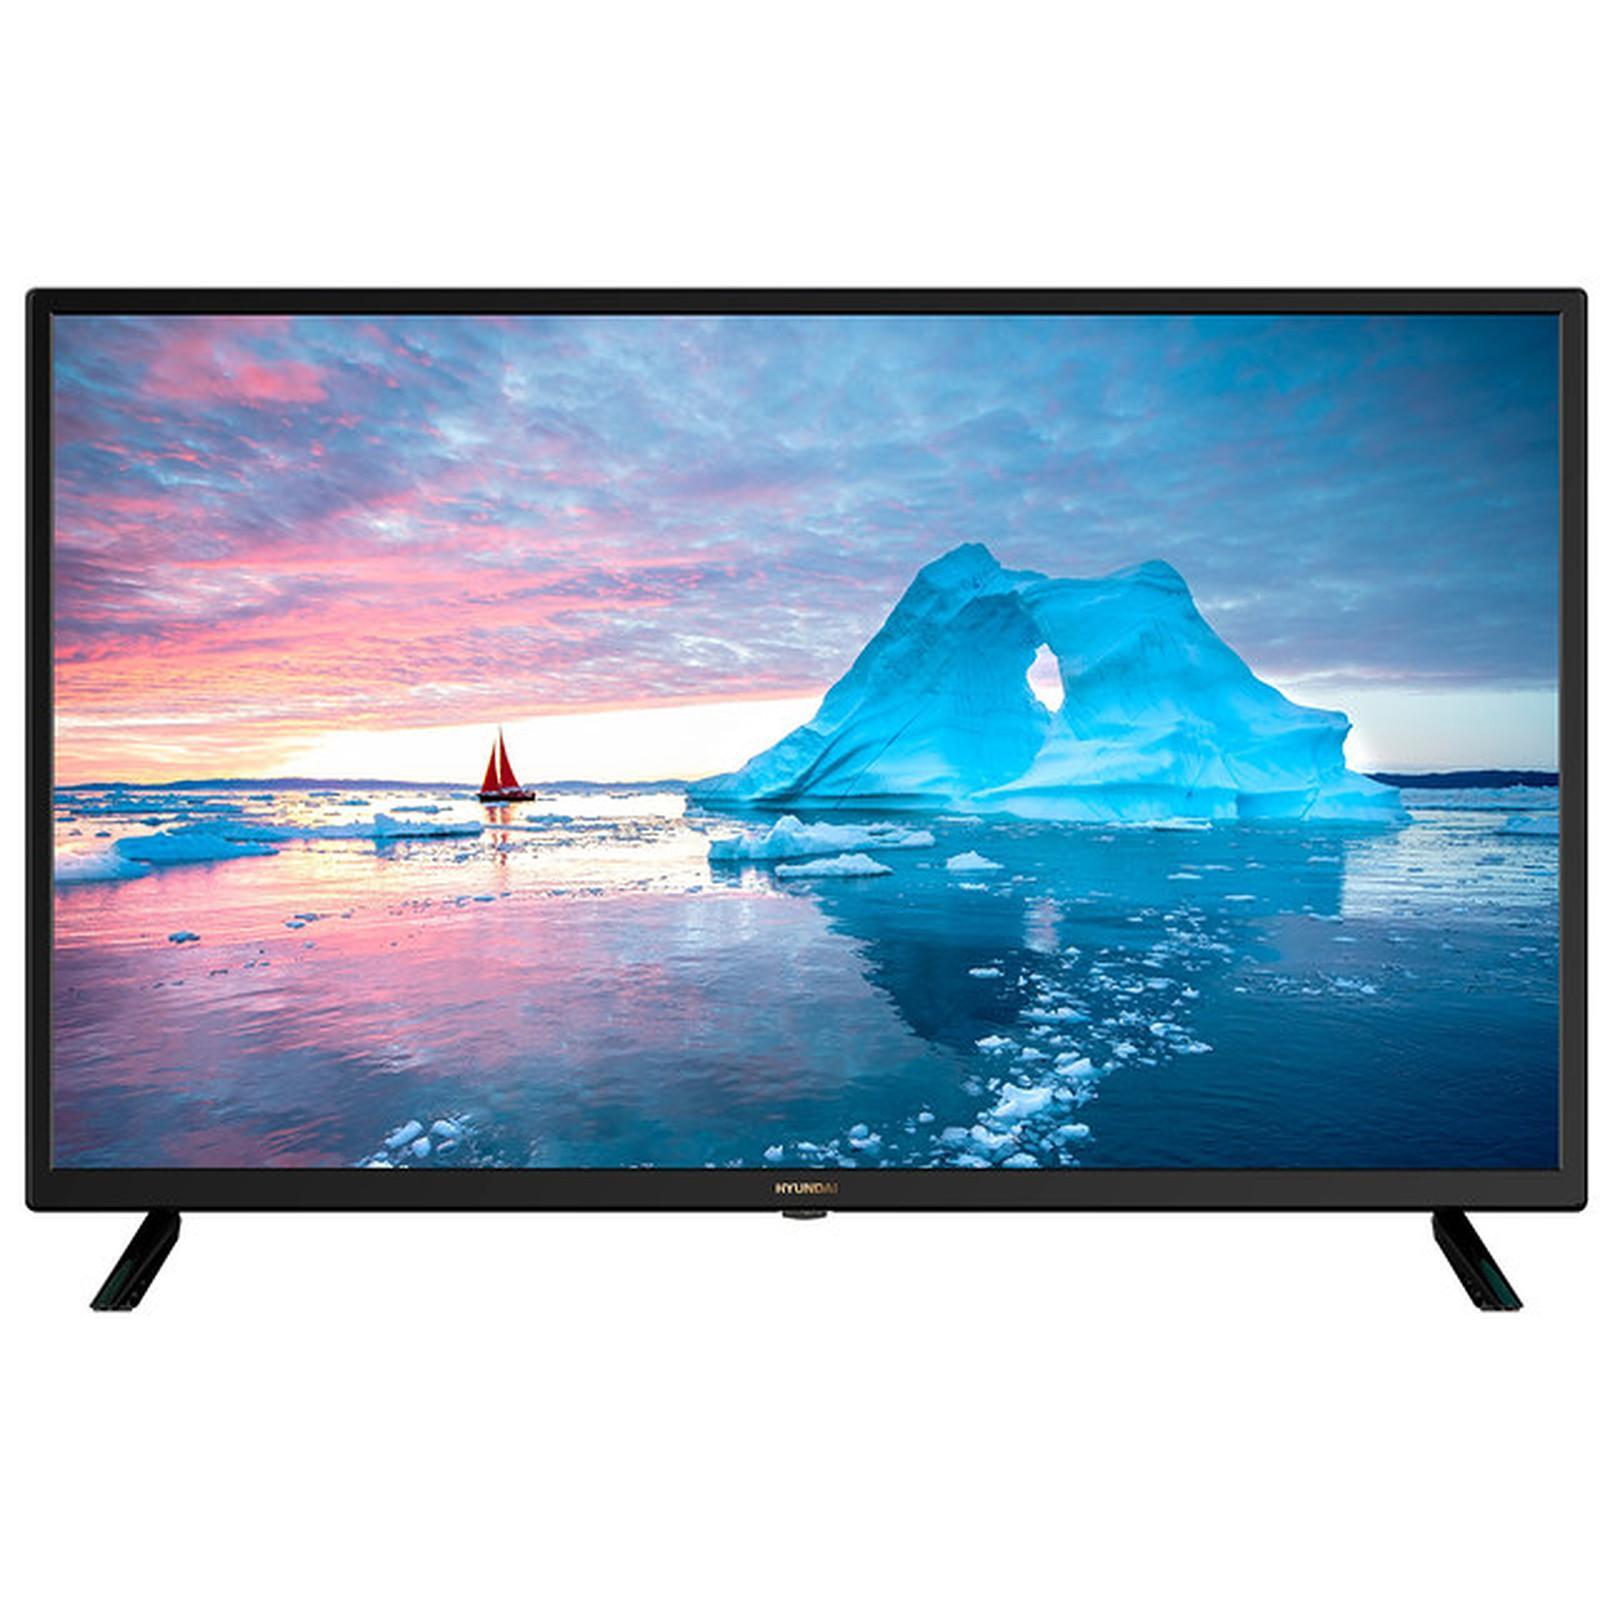 TV Hyundai LED HD 720p 81 cm HY-TQL32R4-010